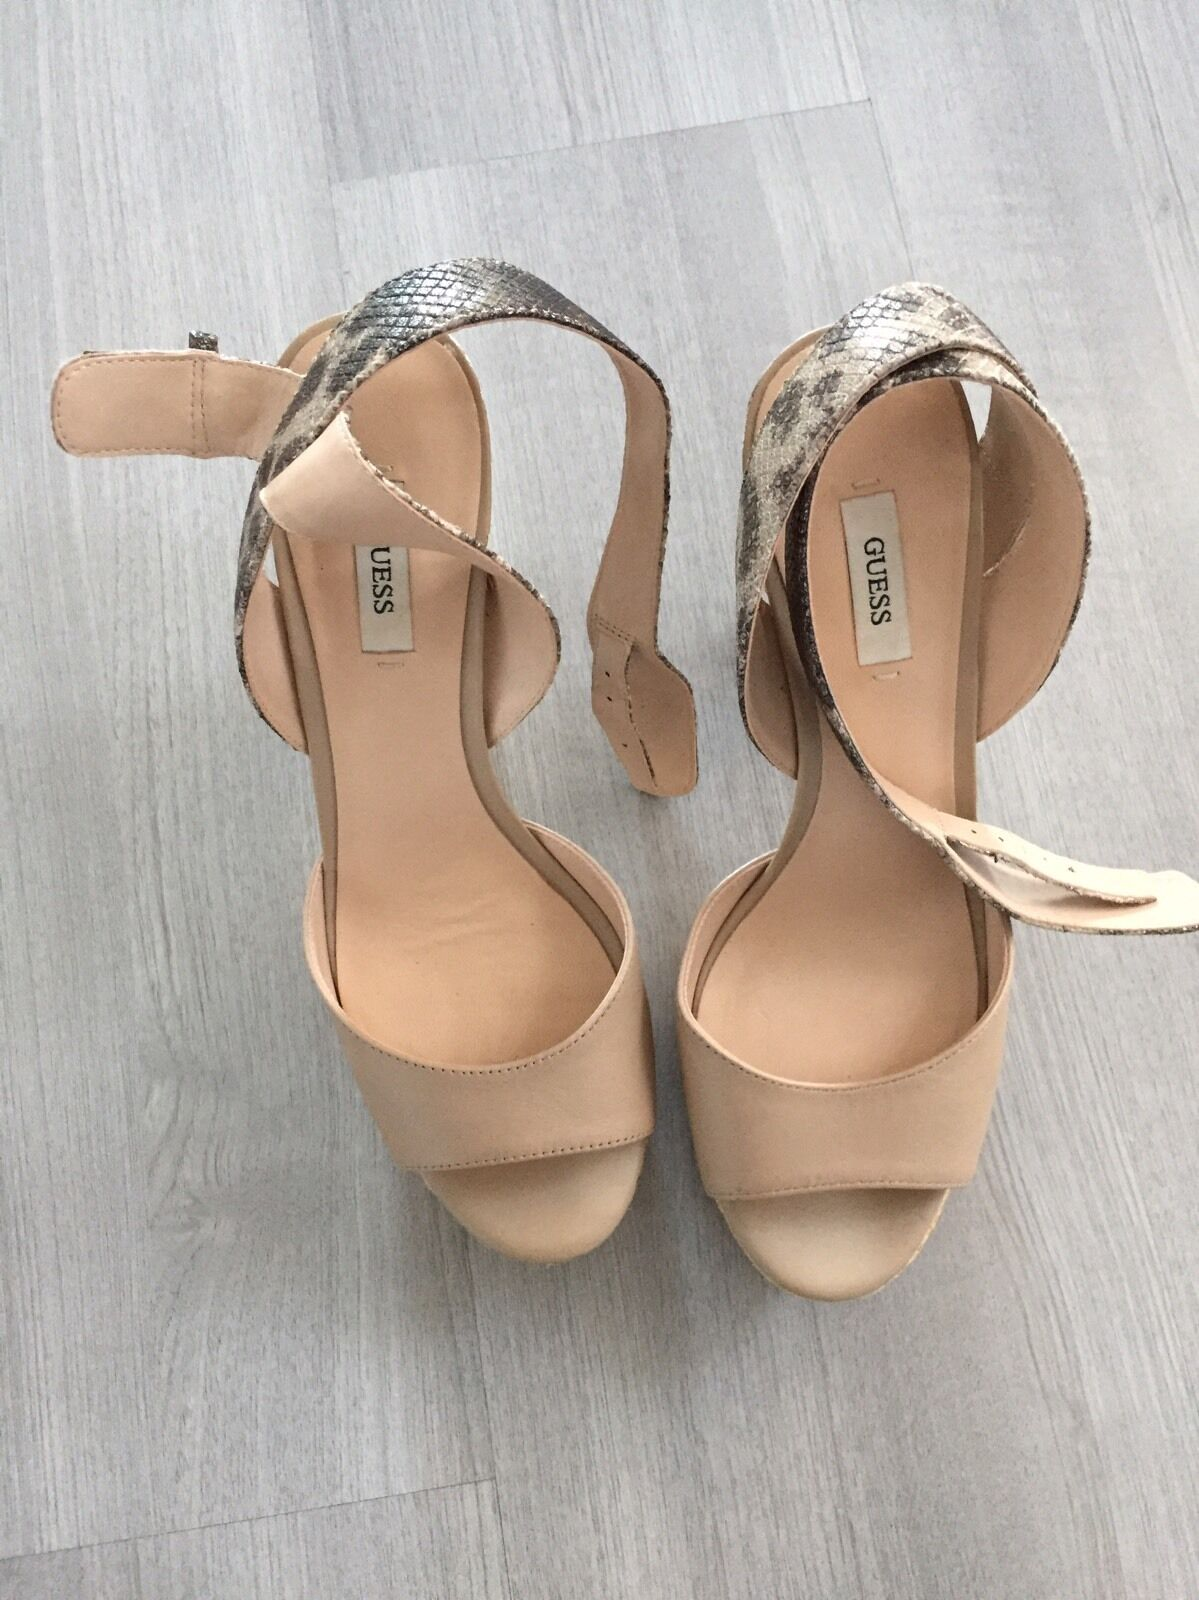 Nuovissimi Sandalo Sandalo Sandalo Guess Con Scatola 8166ed